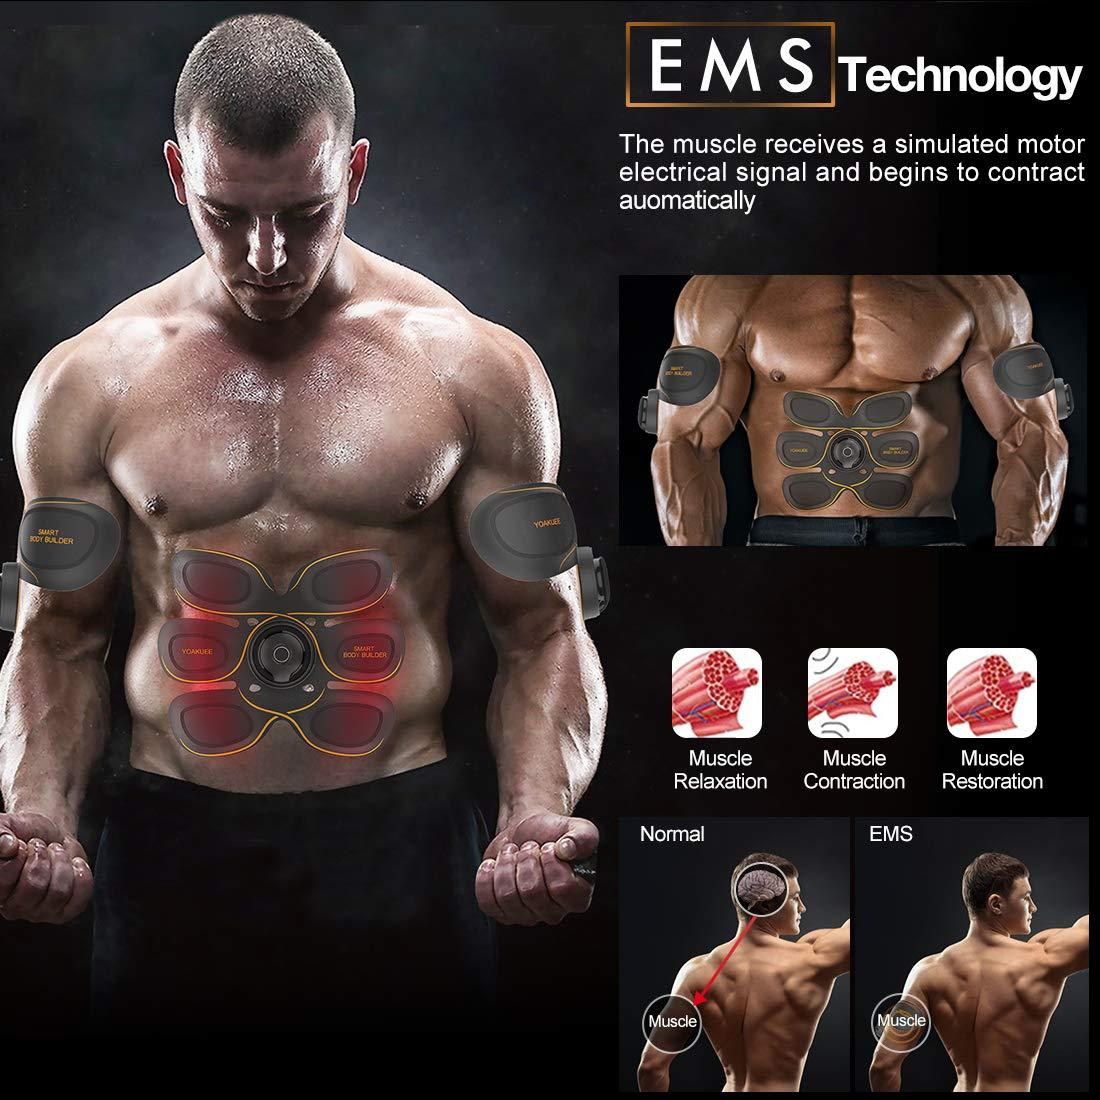 YOAKUEE Electroestimulador Muscular Abdomina Controllo Tramite Smartphone-50 Niveles